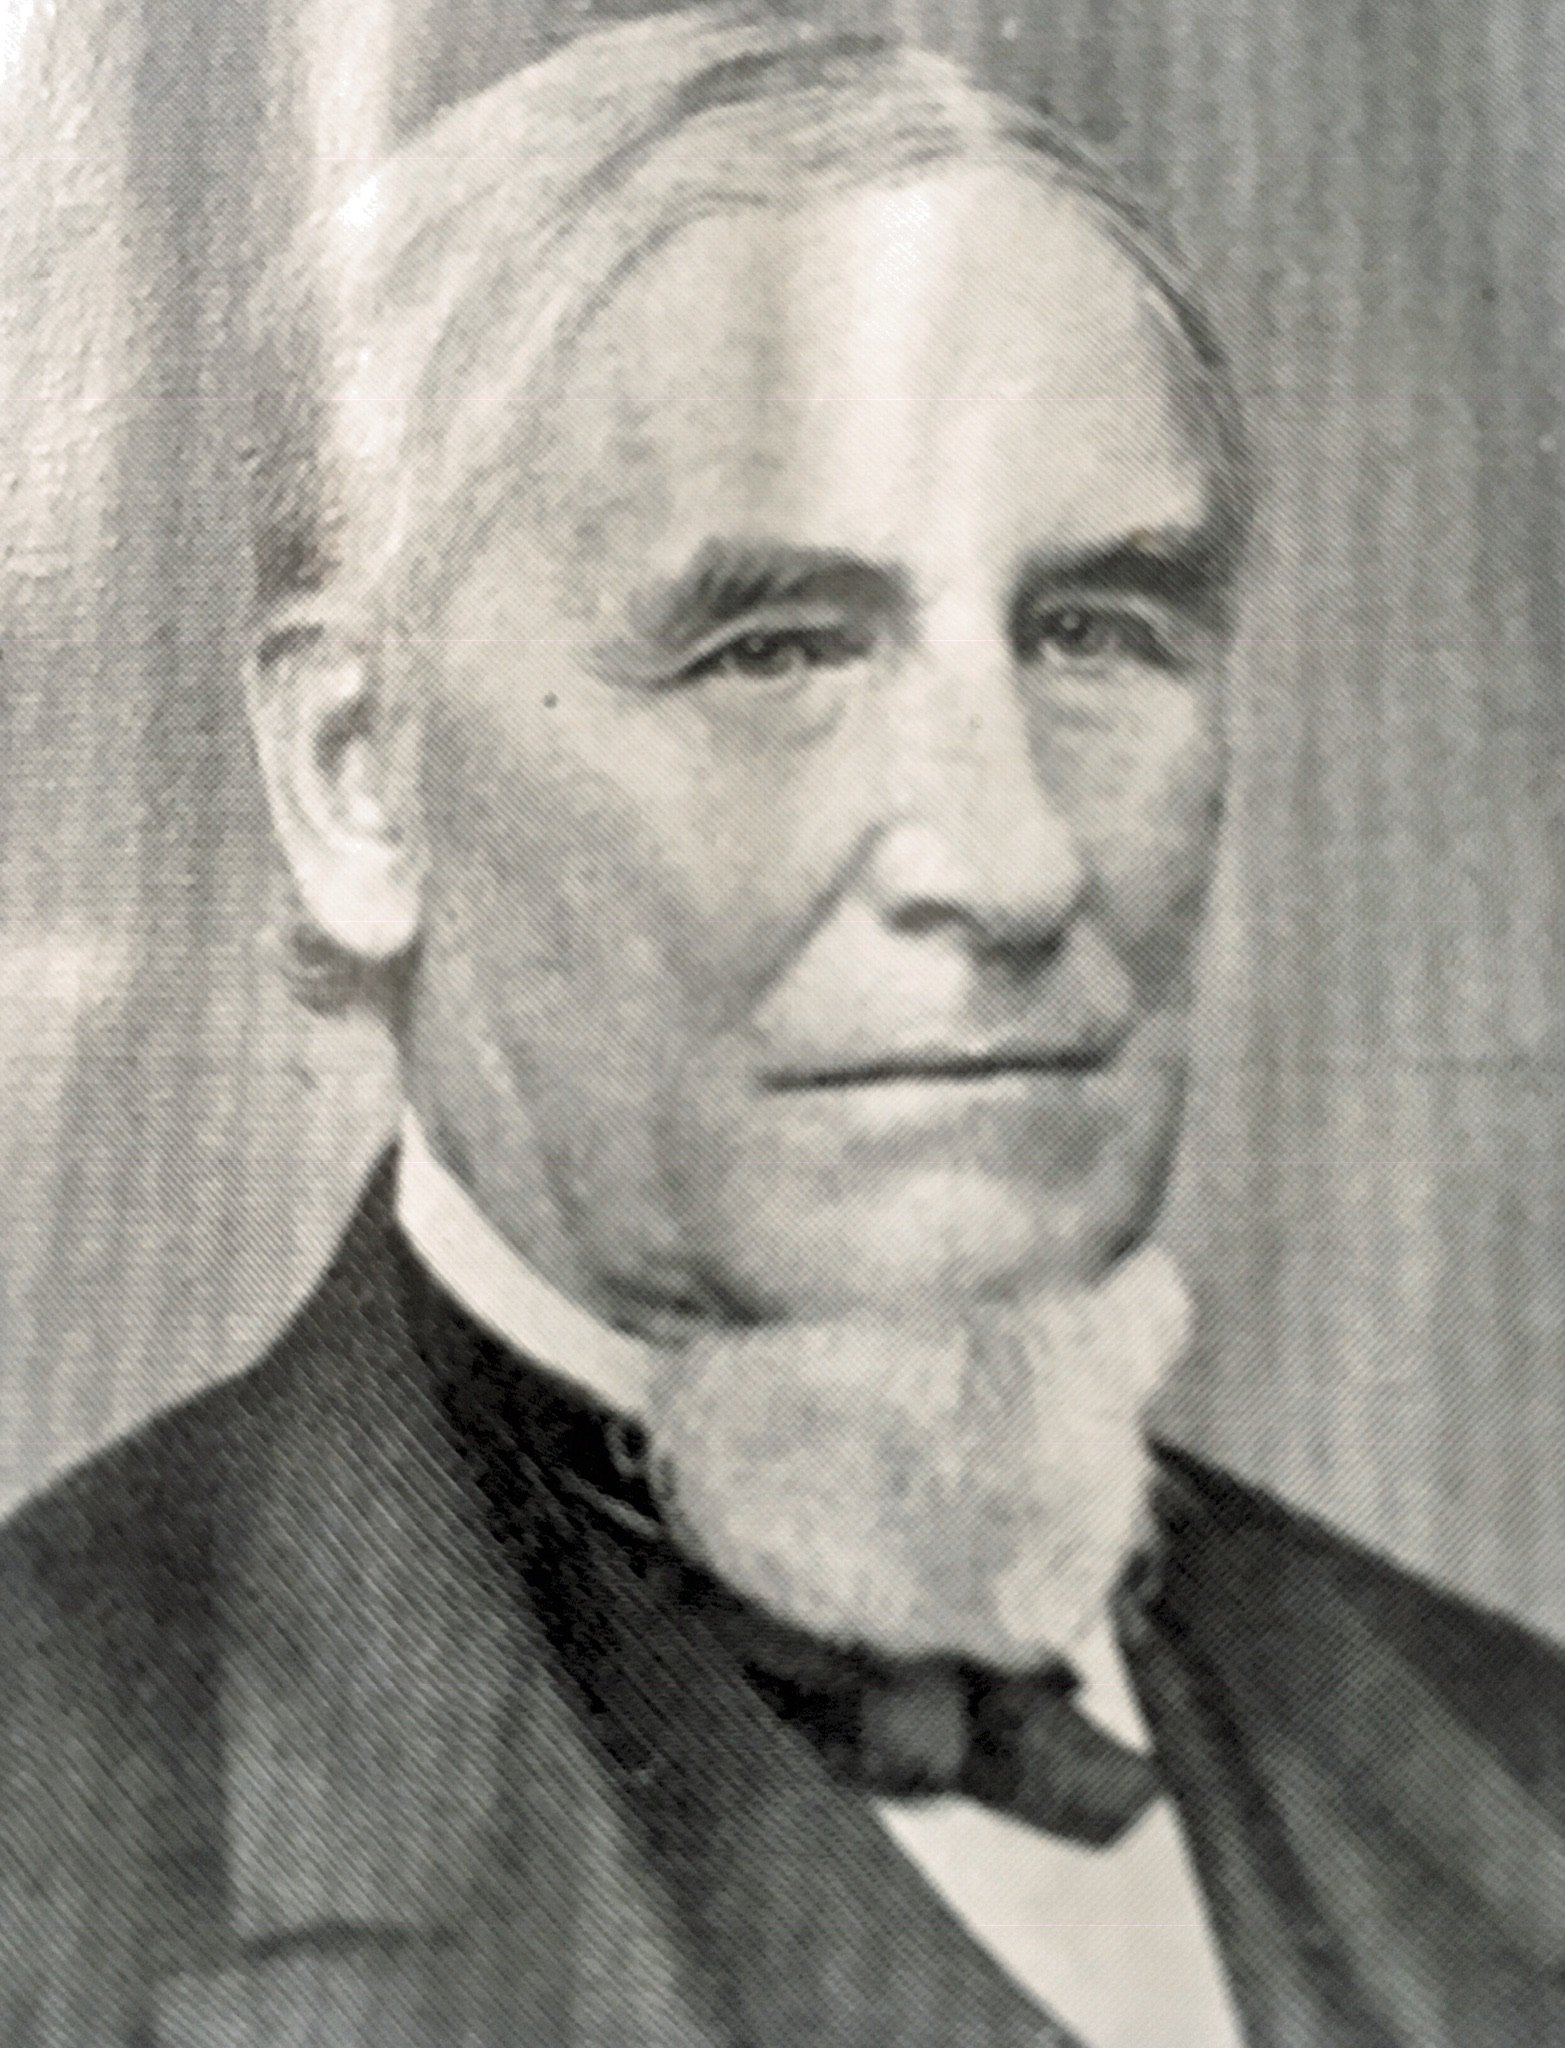 Samuel Price.